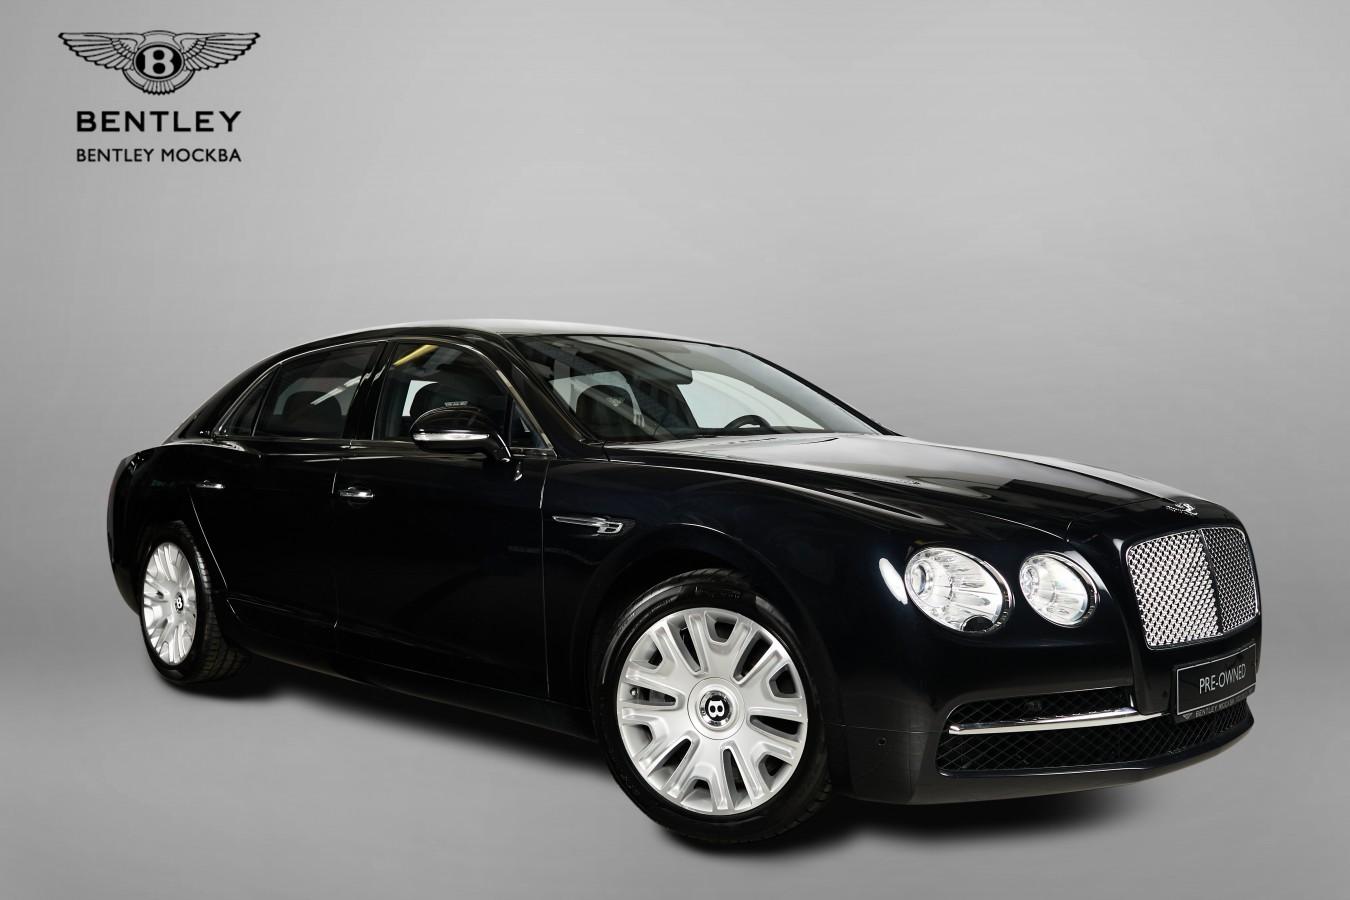 Bentley Continental GT Speed - изображение EQ6A6347_1 на Bentleymoscow.ru!